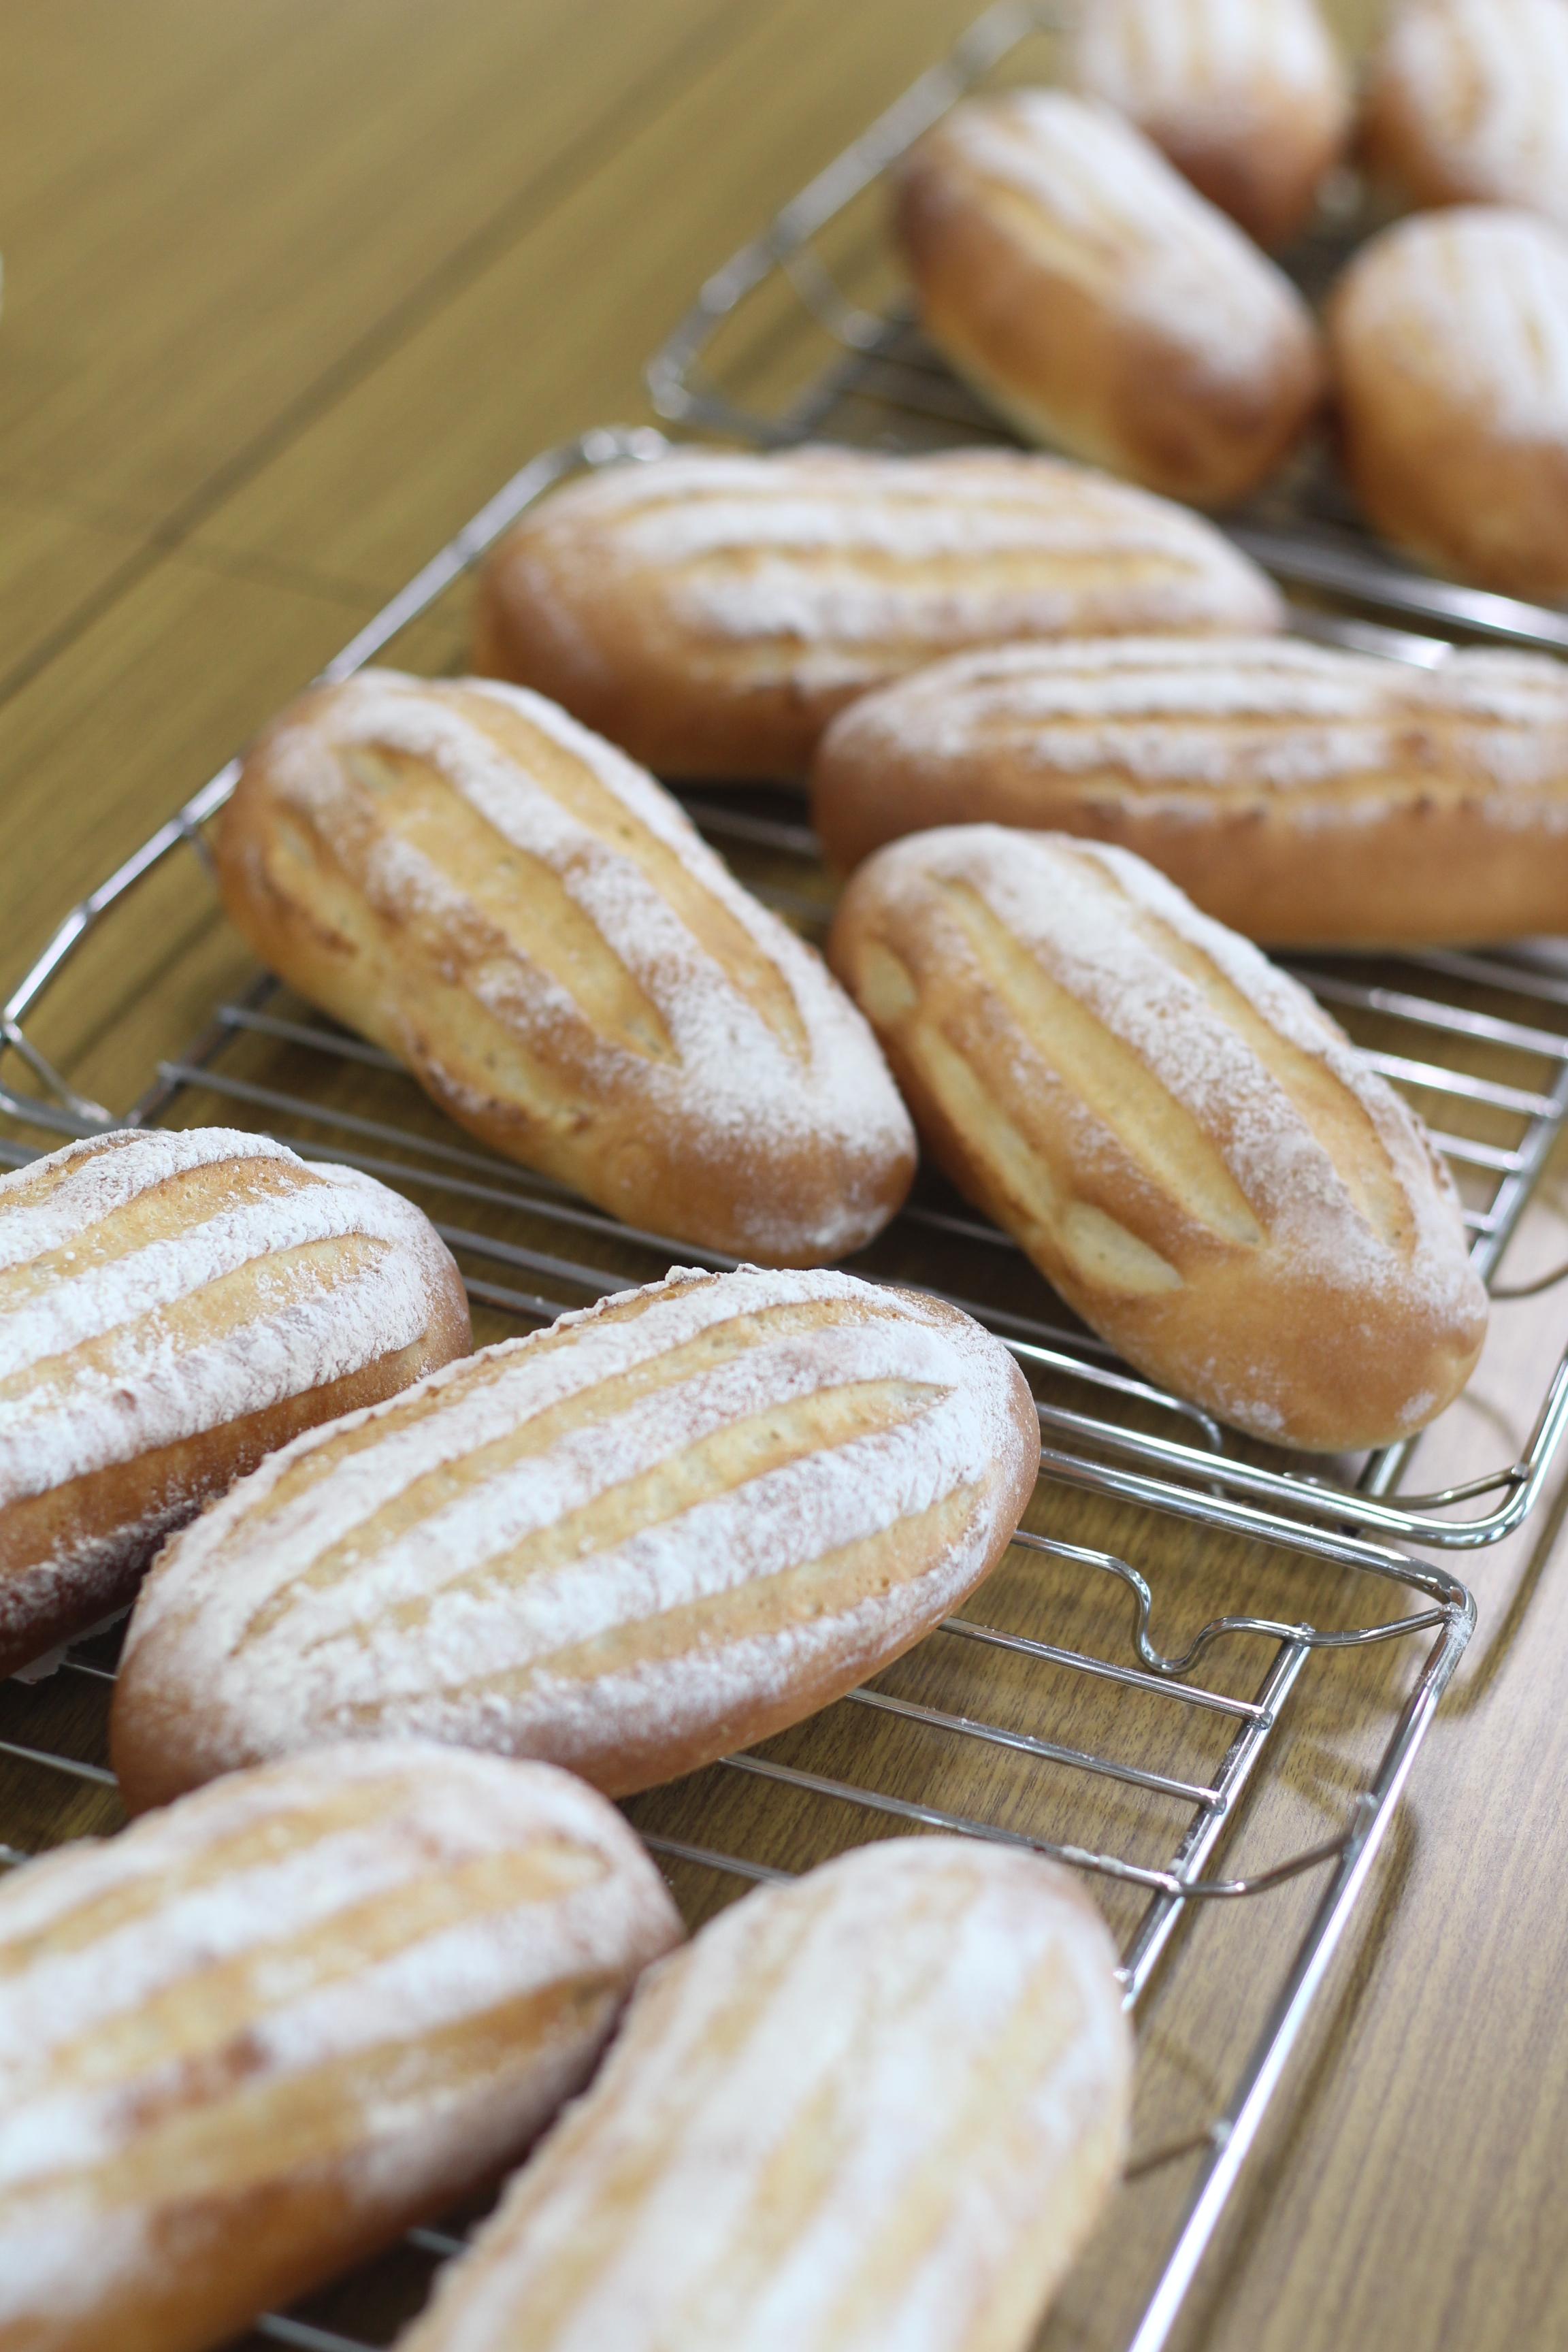 a-ta-sante糖質制限パン料理教室、阿倍野区西田辺。会館でのレッスン『セミハードブレッド』